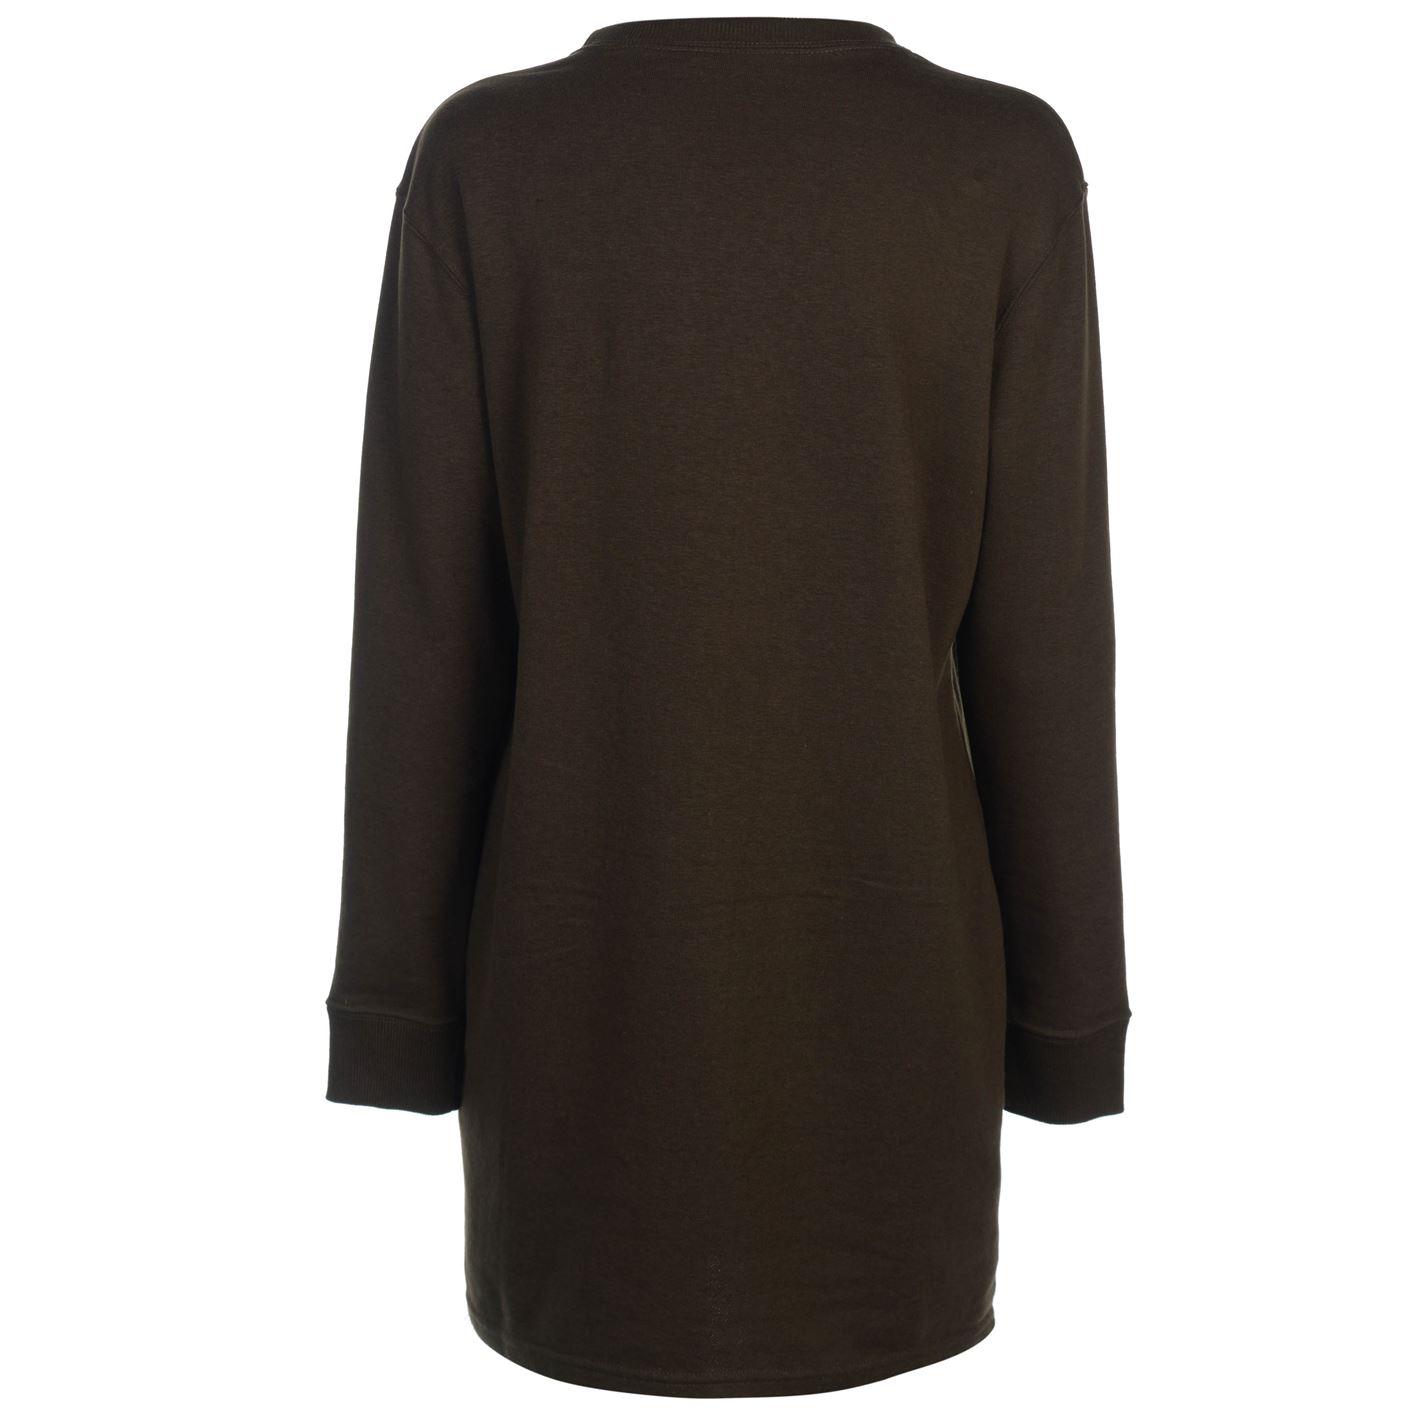 Golddigga Distressed Dress Ladies Crew Pullover Jumper Full Length Sleeve Neck